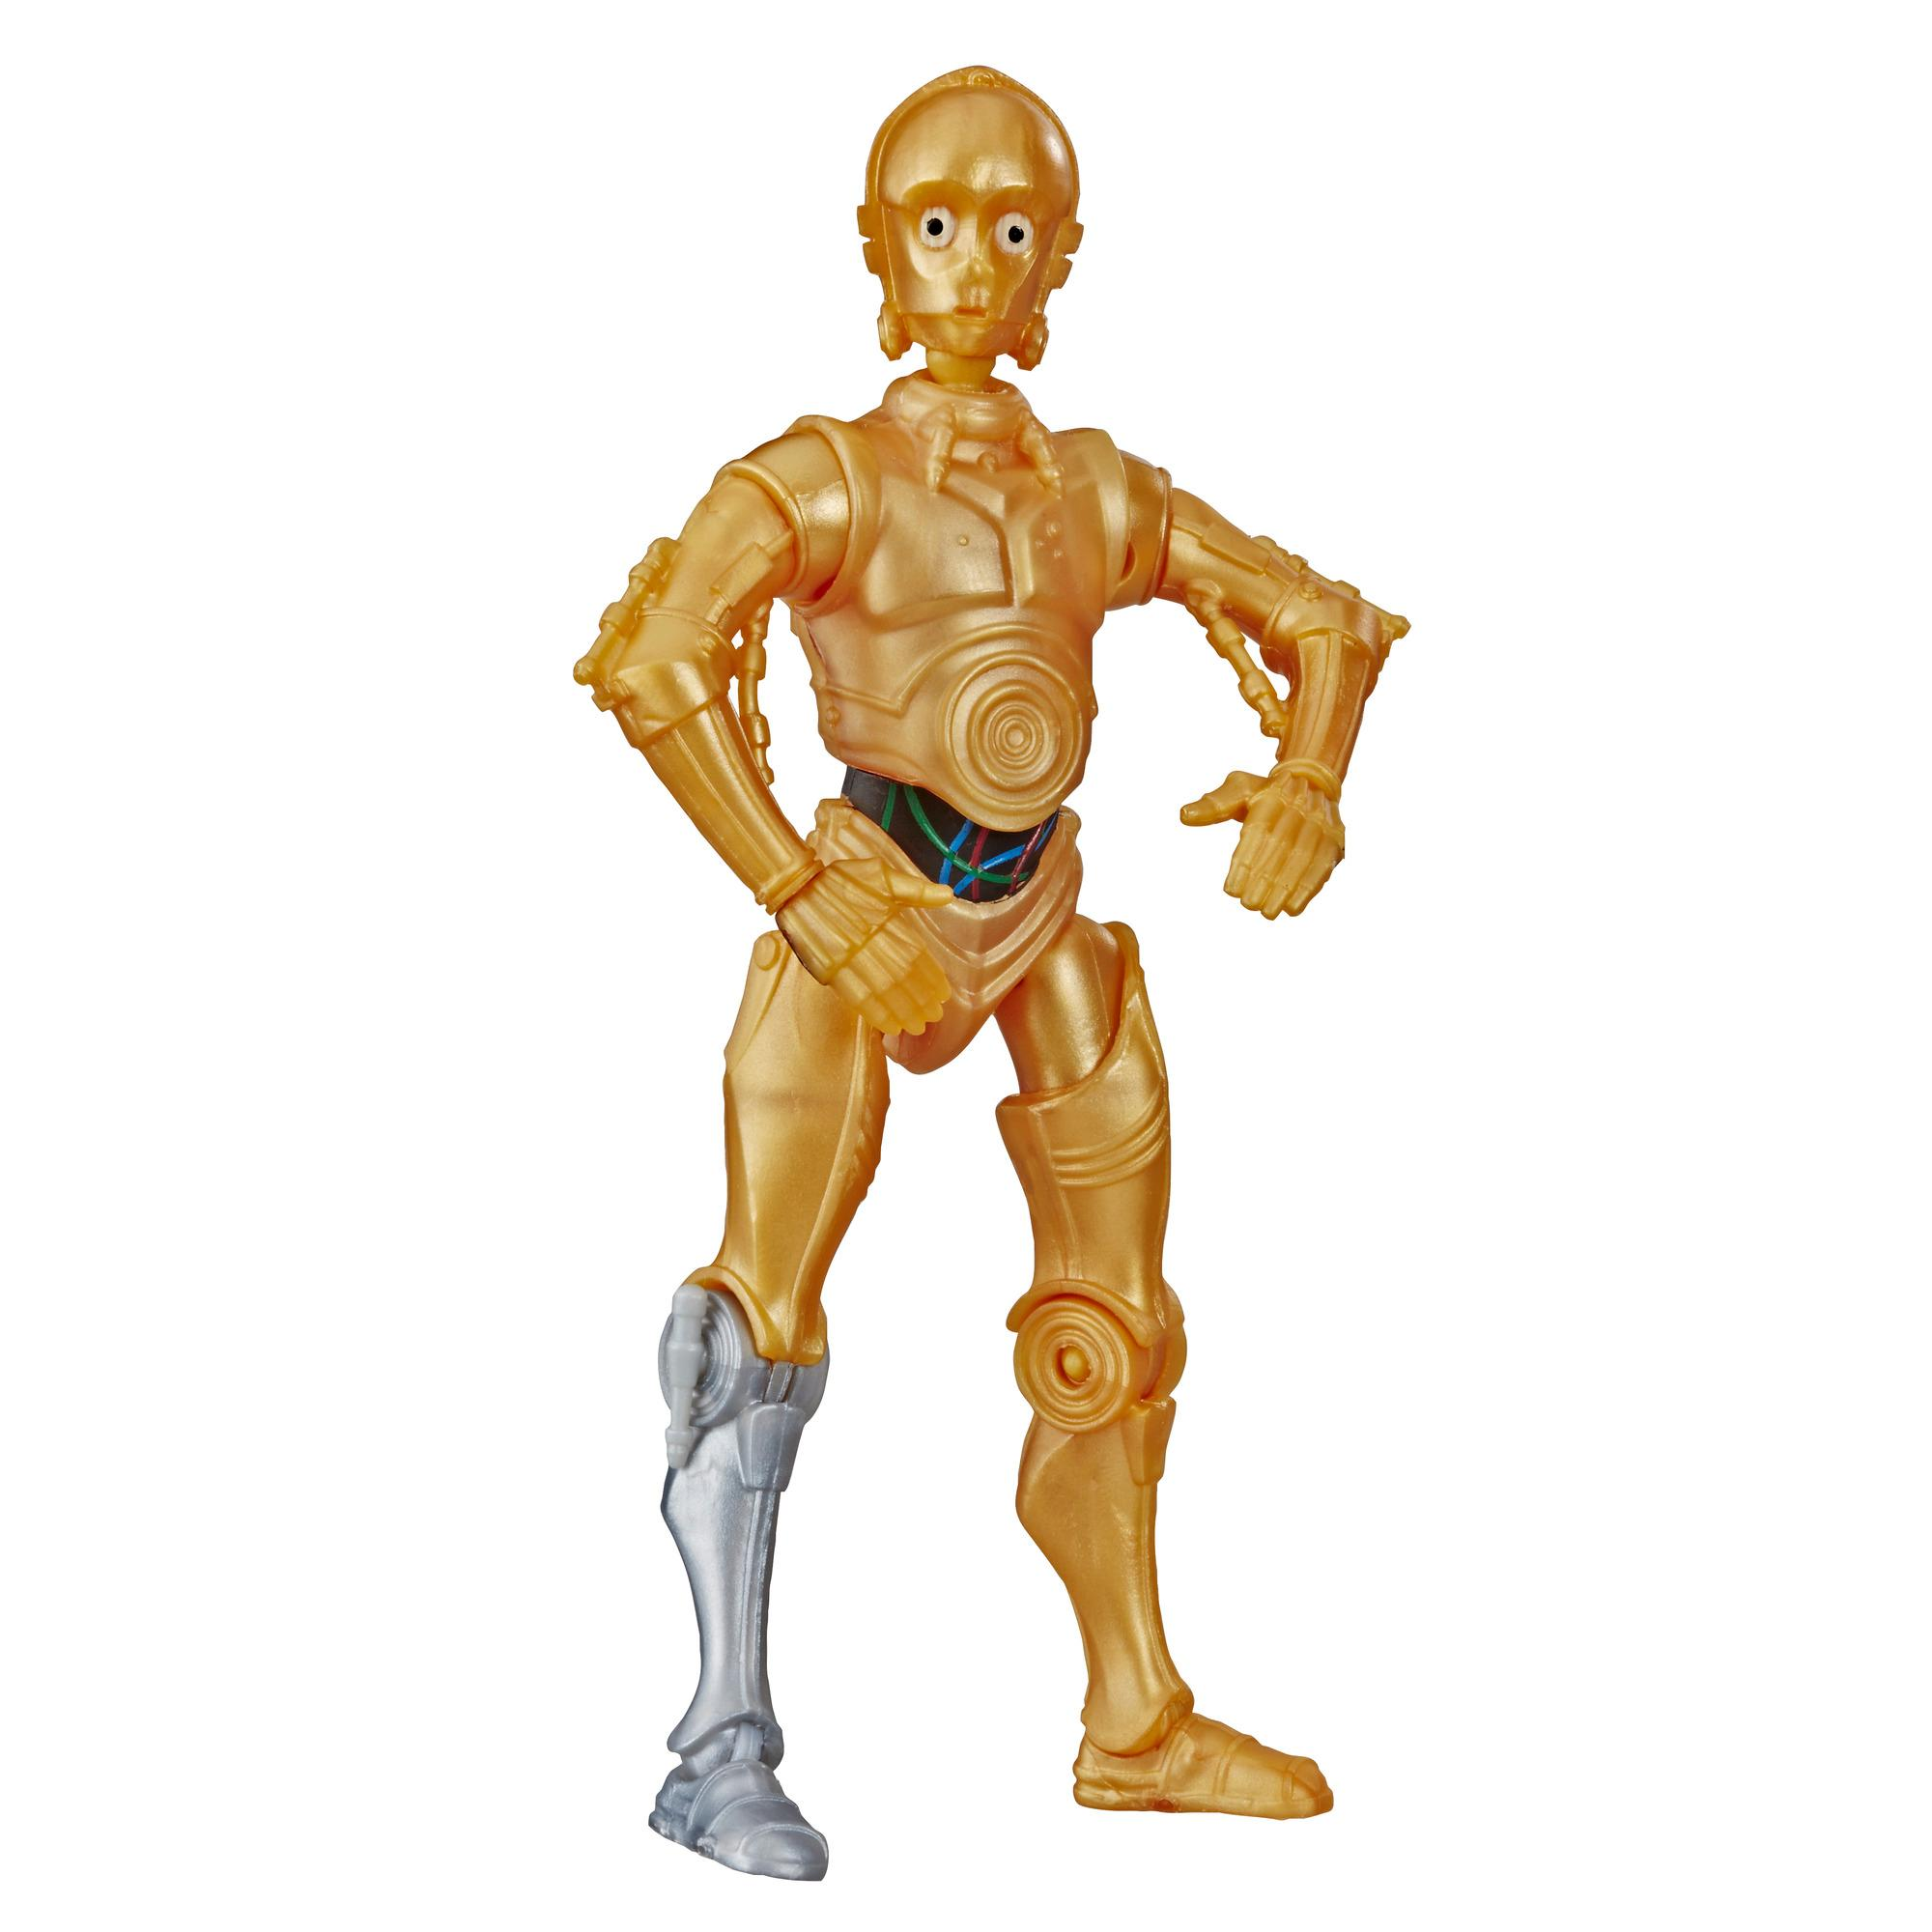 Star Wars Galaxy of Adventures C-3PO Action-Figur